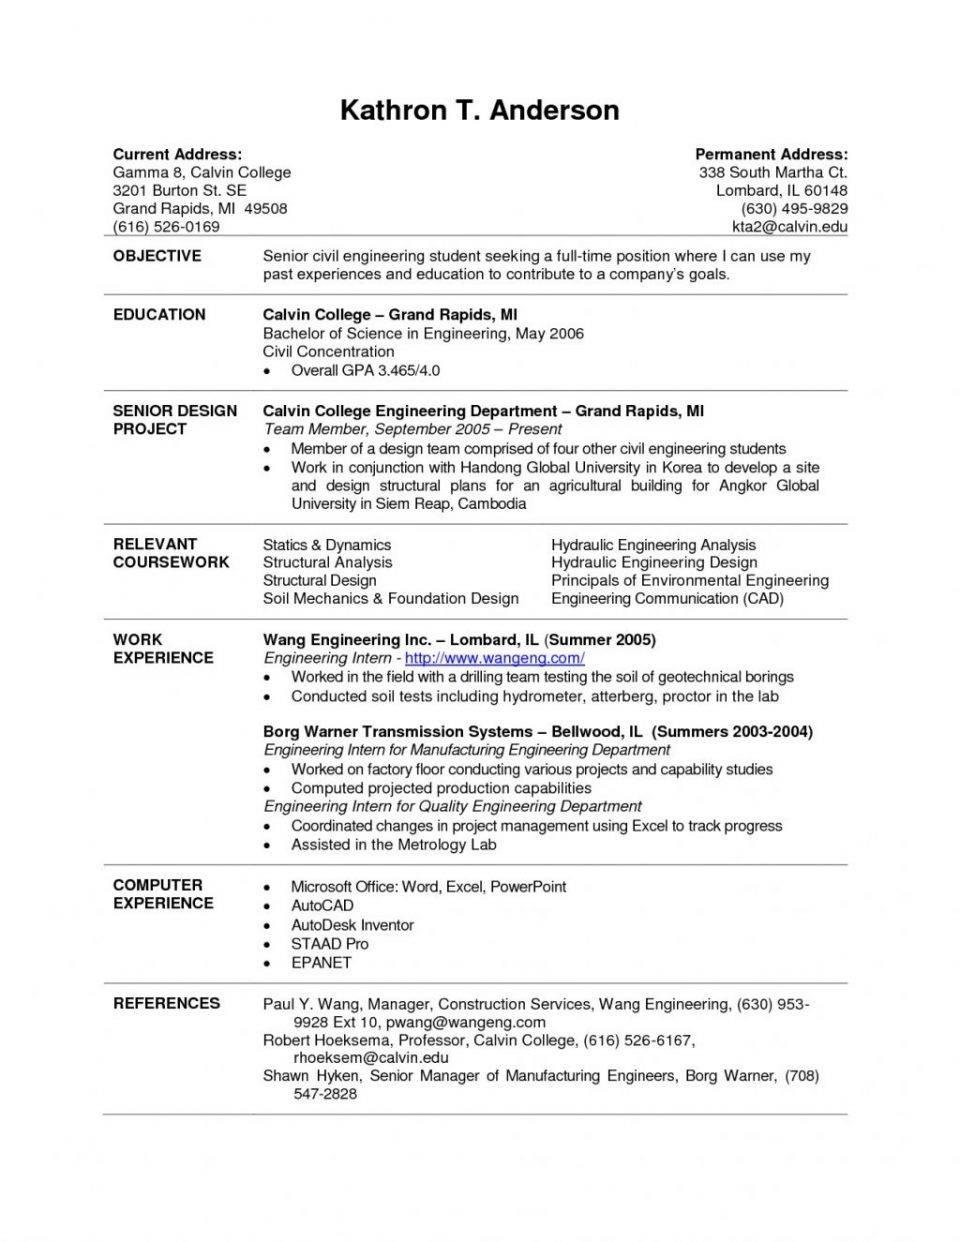 Resume Template For Undergraduate College Student